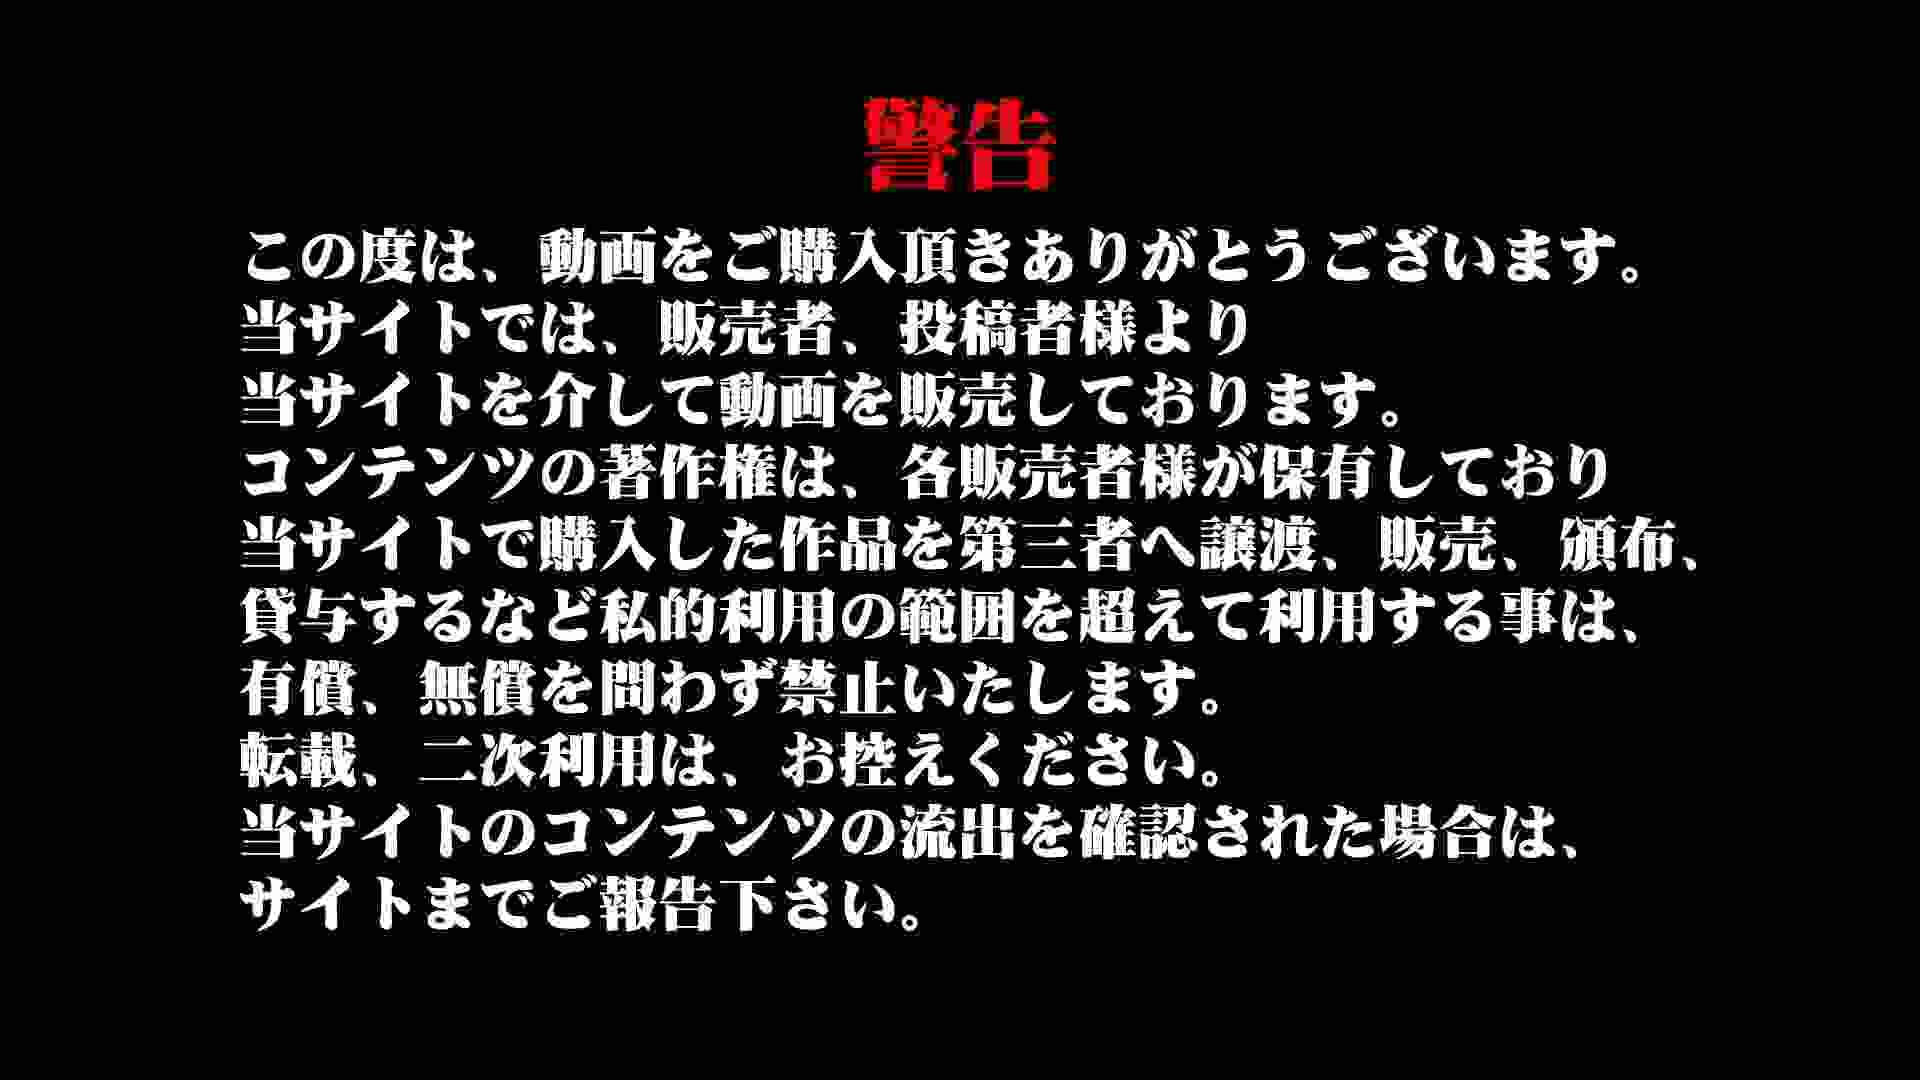 Aquaな露天風呂Vol.874潜入盗撮露天風呂十判湯 其の一 潜入 覗き性交動画流出 81連発 2